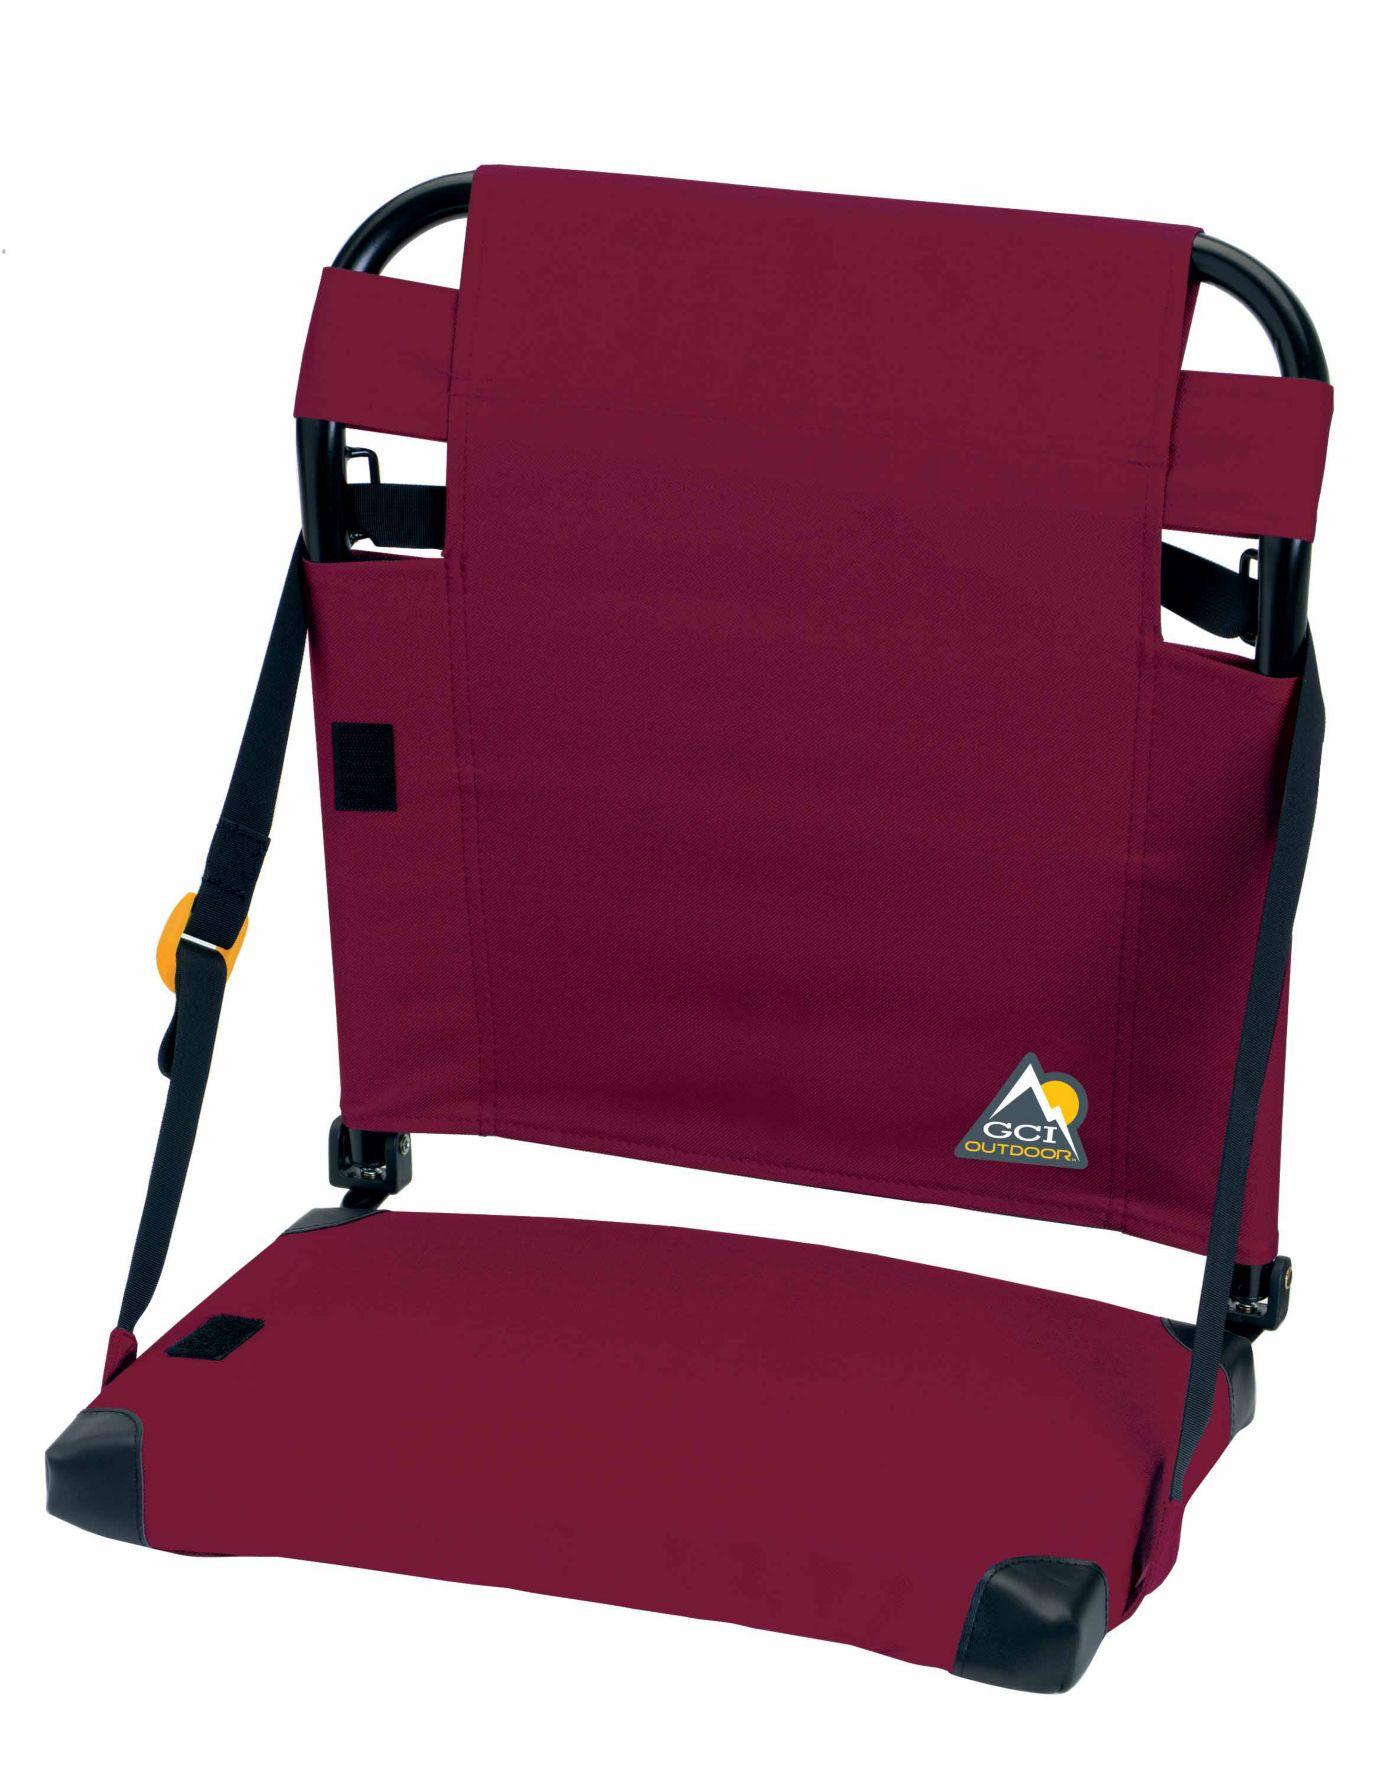 GCI Outdoor Bleacher-Back Stadium Seat